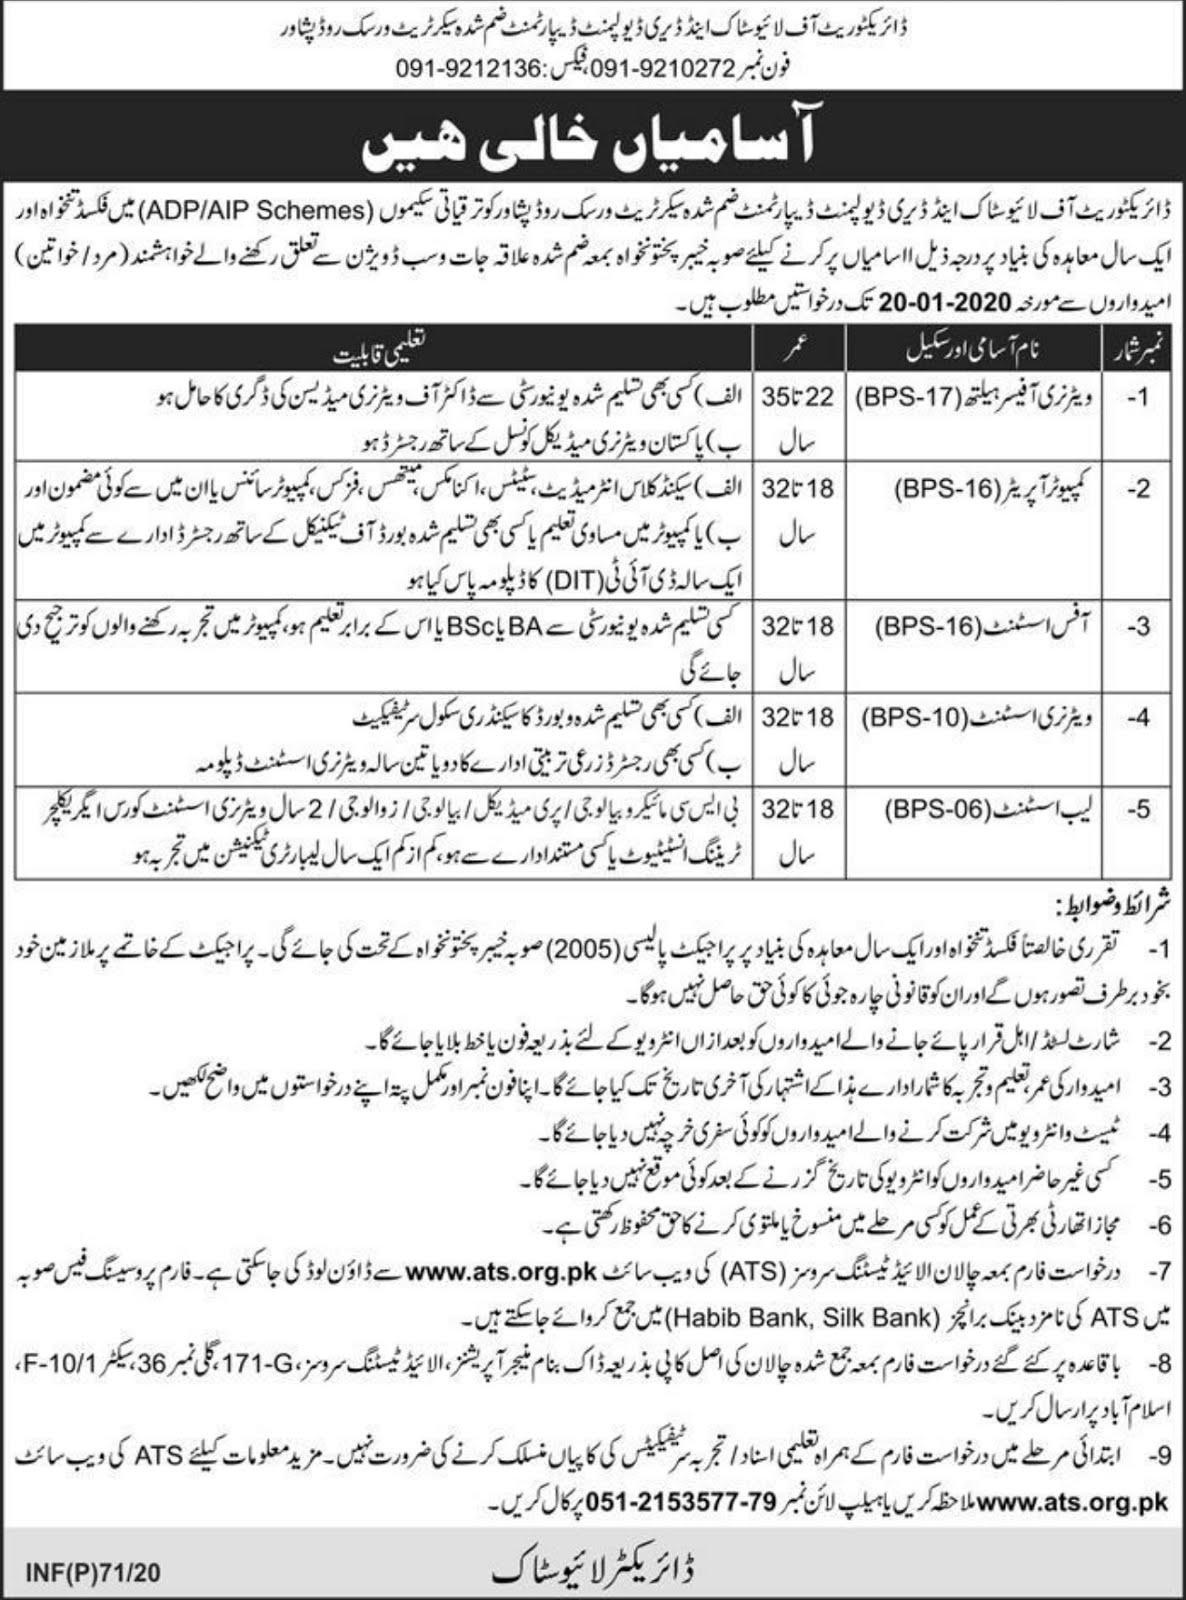 Directorate of Livestock & Dairy Development Department Peshawar KPK Jobs 2020